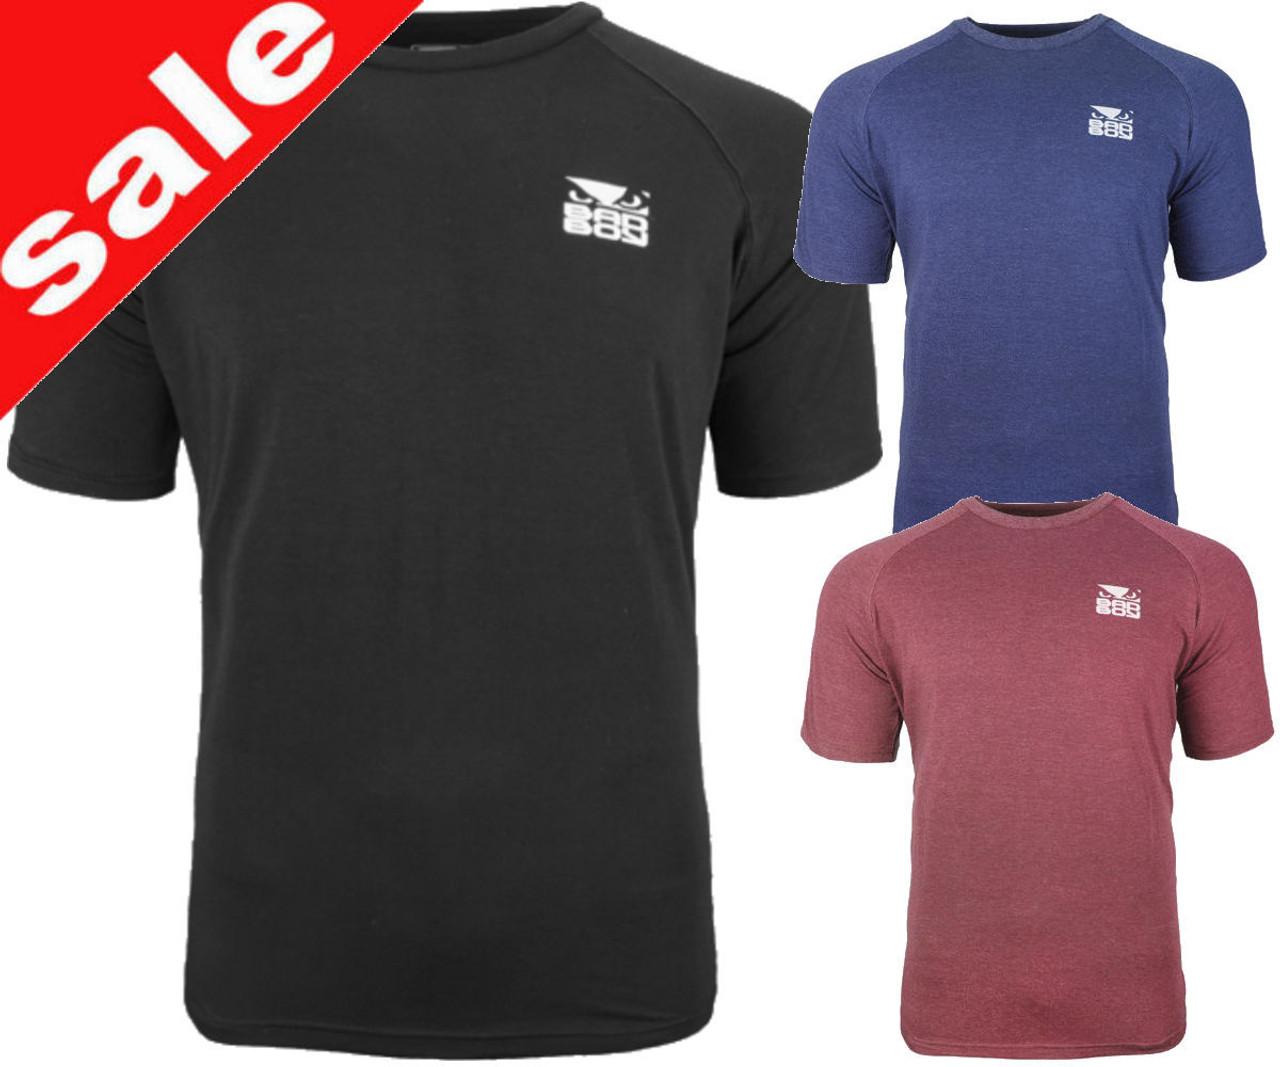 Bad Boy MMA Karate T Shirt Casual Wear Clothing Top Martial Arts